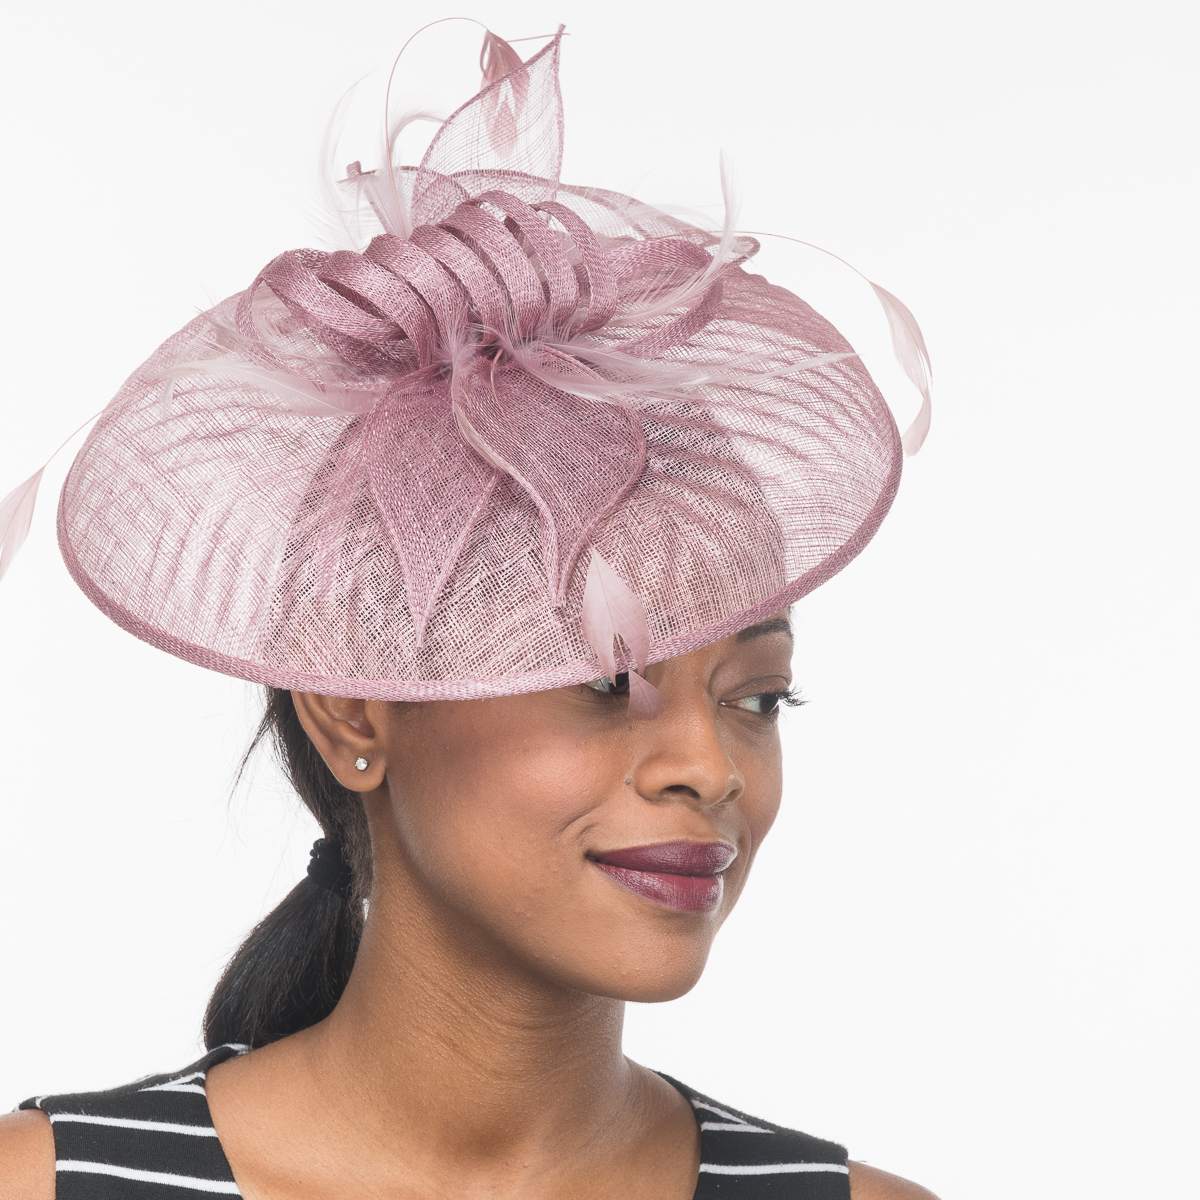 439faea61 Dusty Rose Sinamay Embossed Disc Saucer Headband Fascinator Cocktail Hats